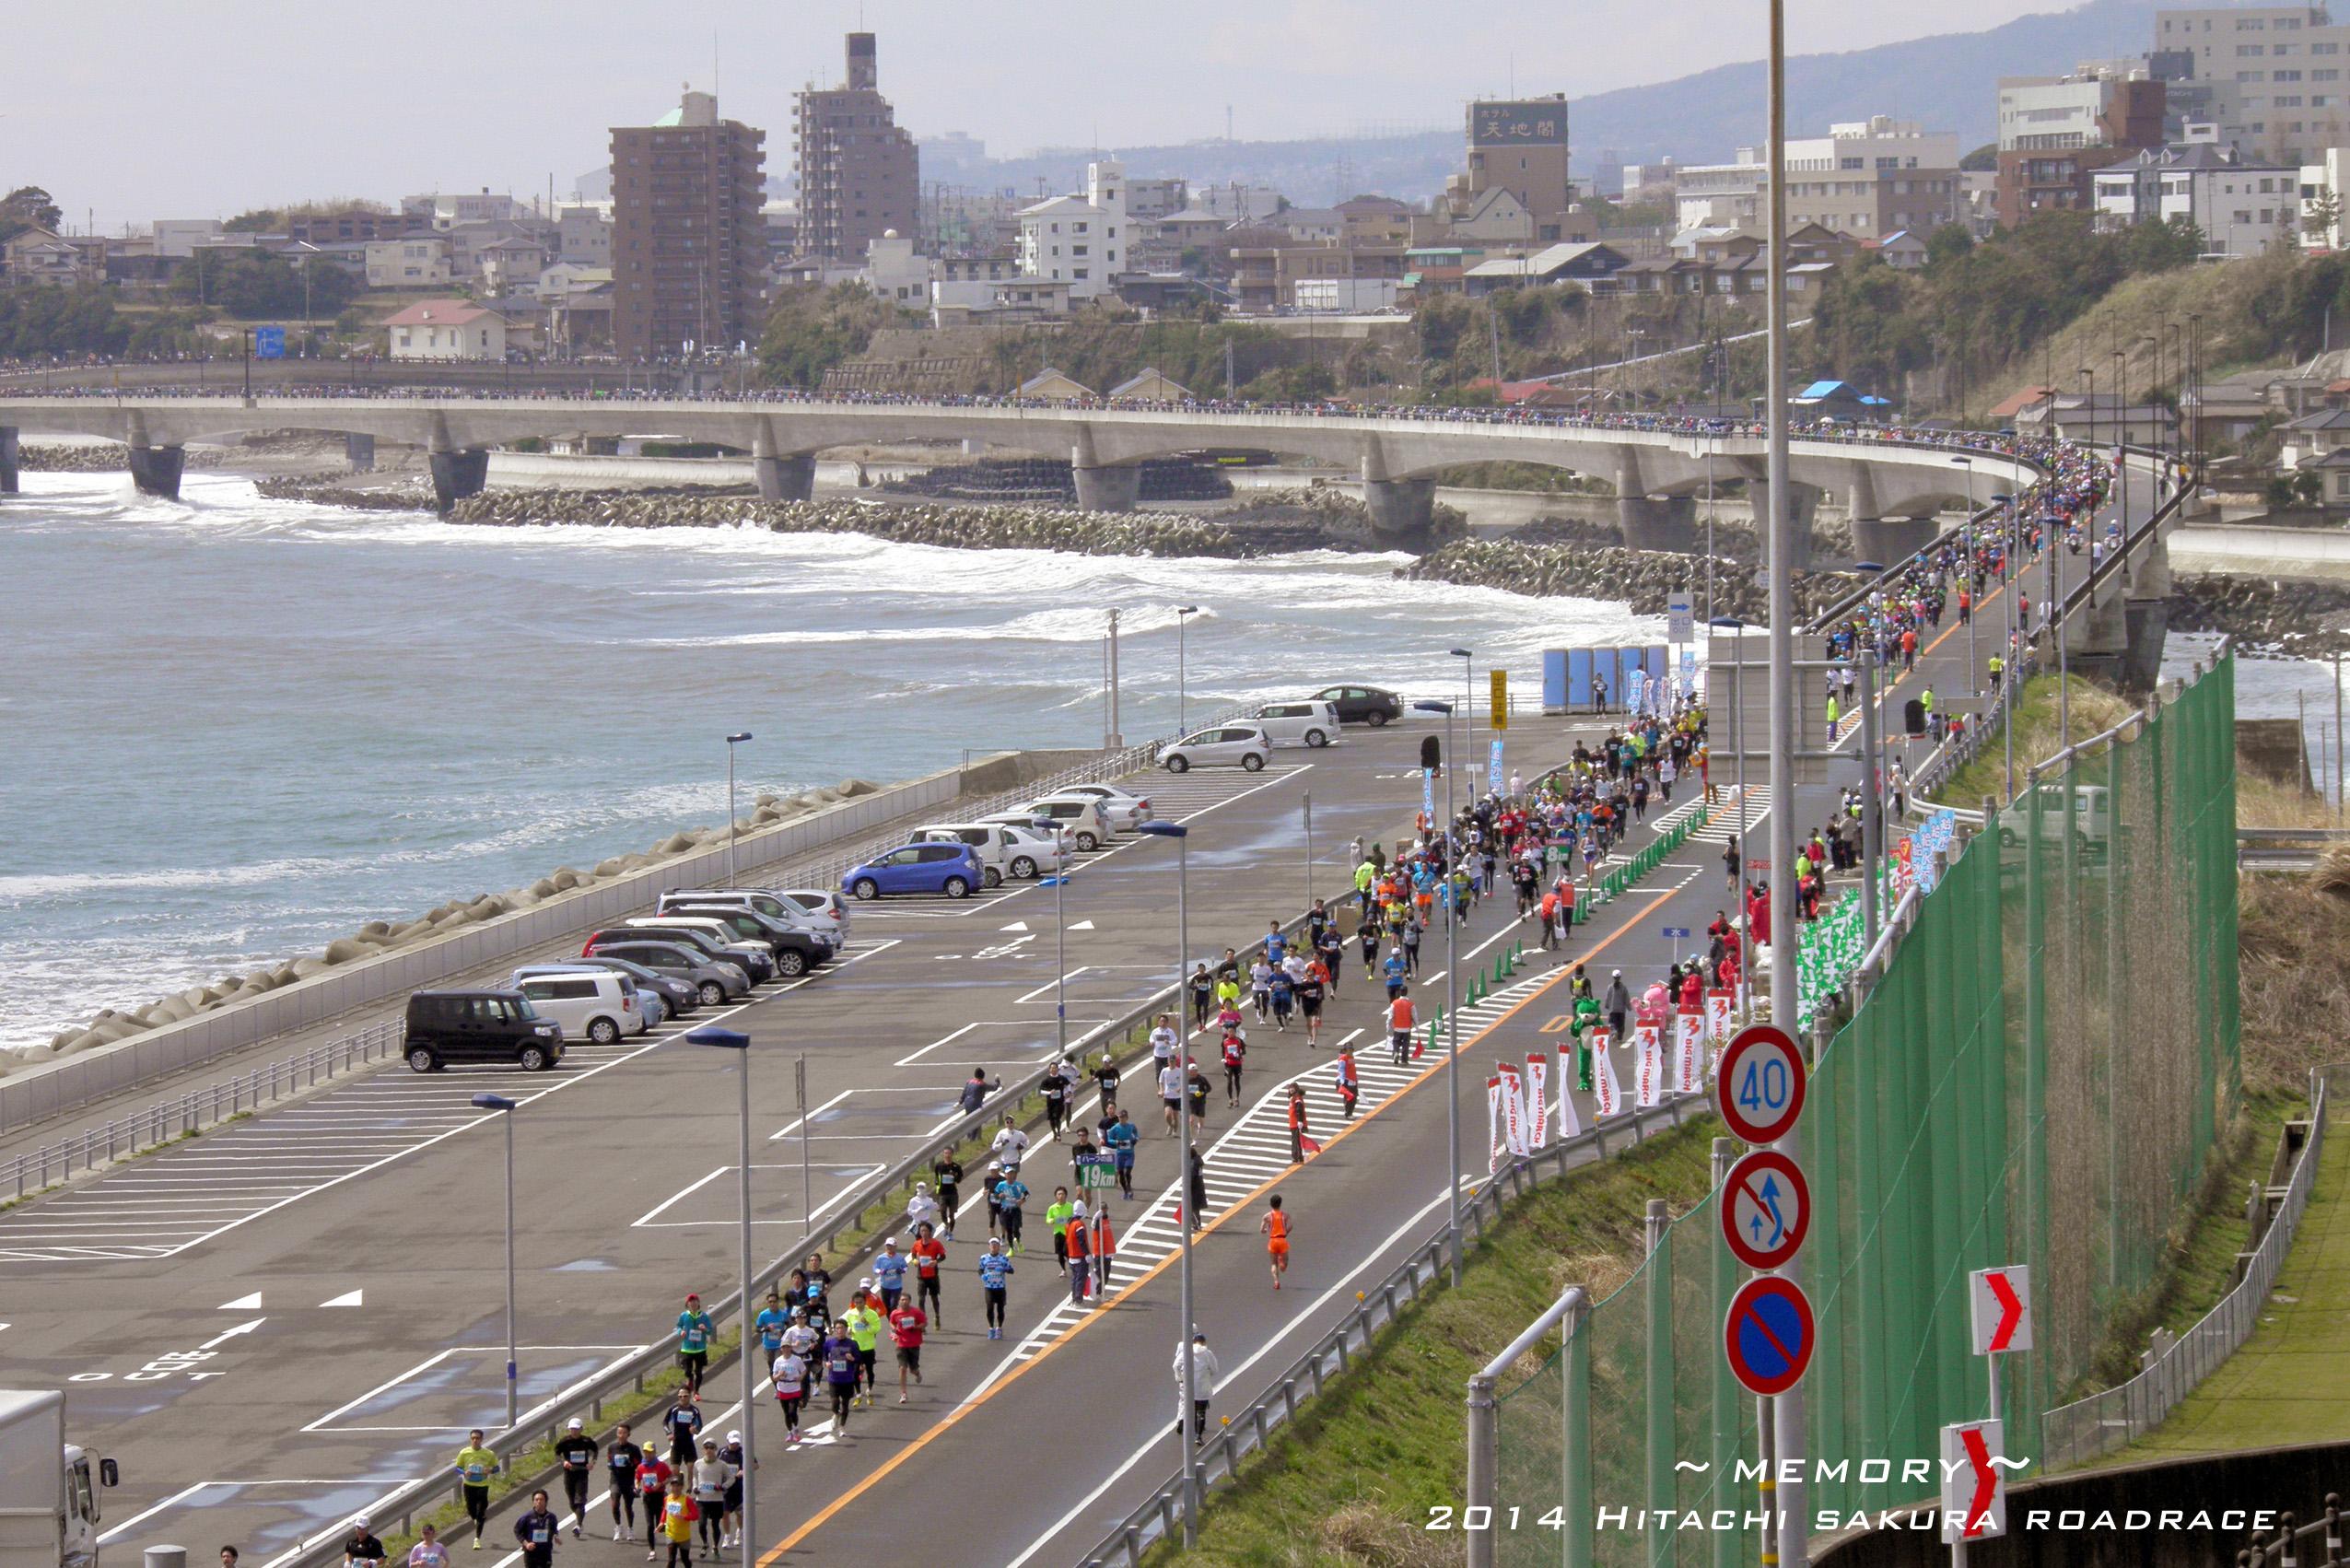 2014 SAKURA Roadrace